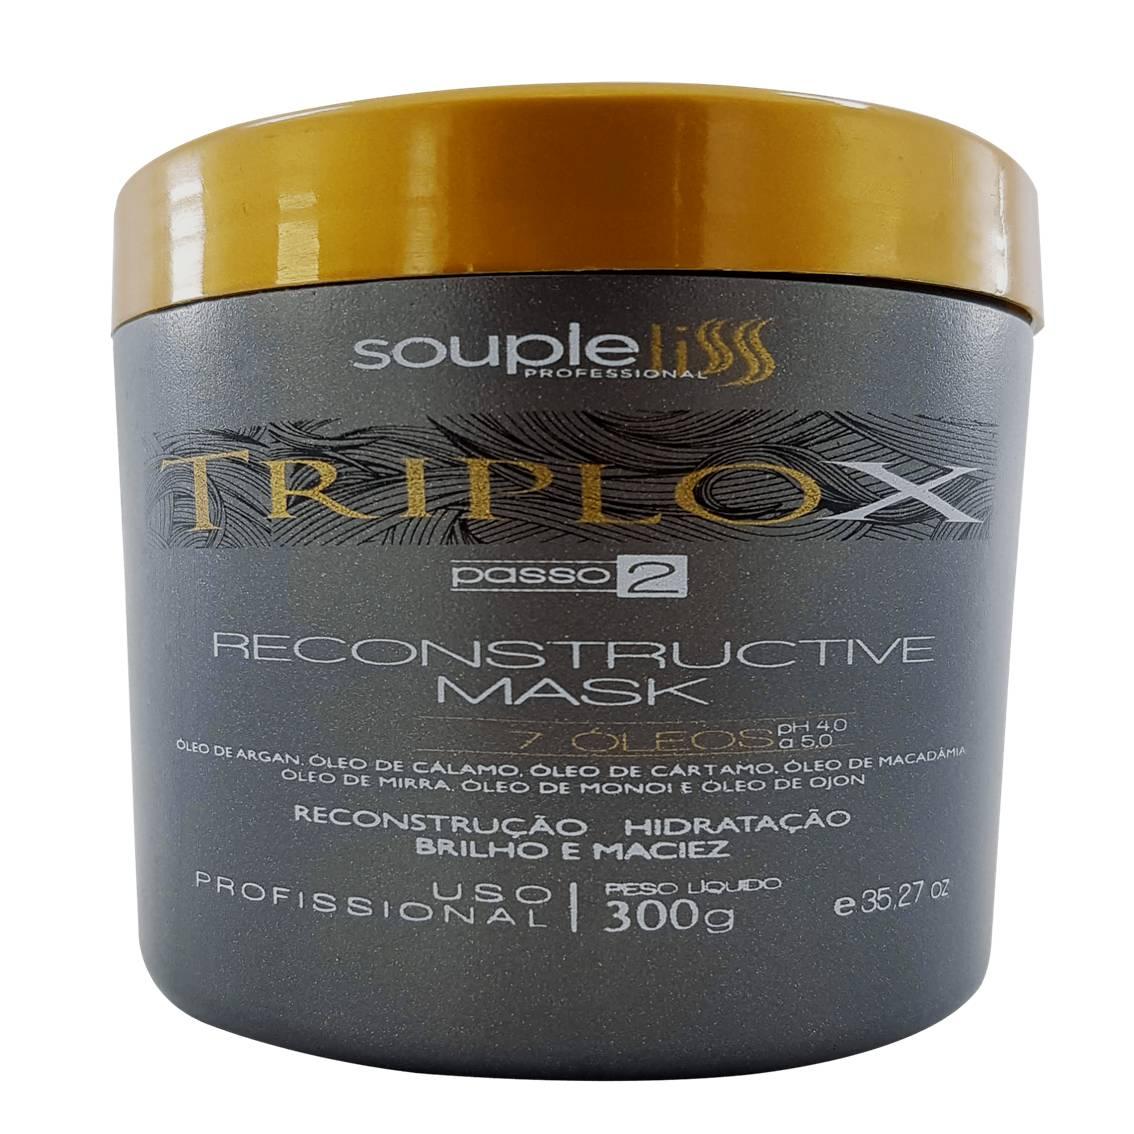 Kit Triplo X Reconstrução Máxima - Souple Liss